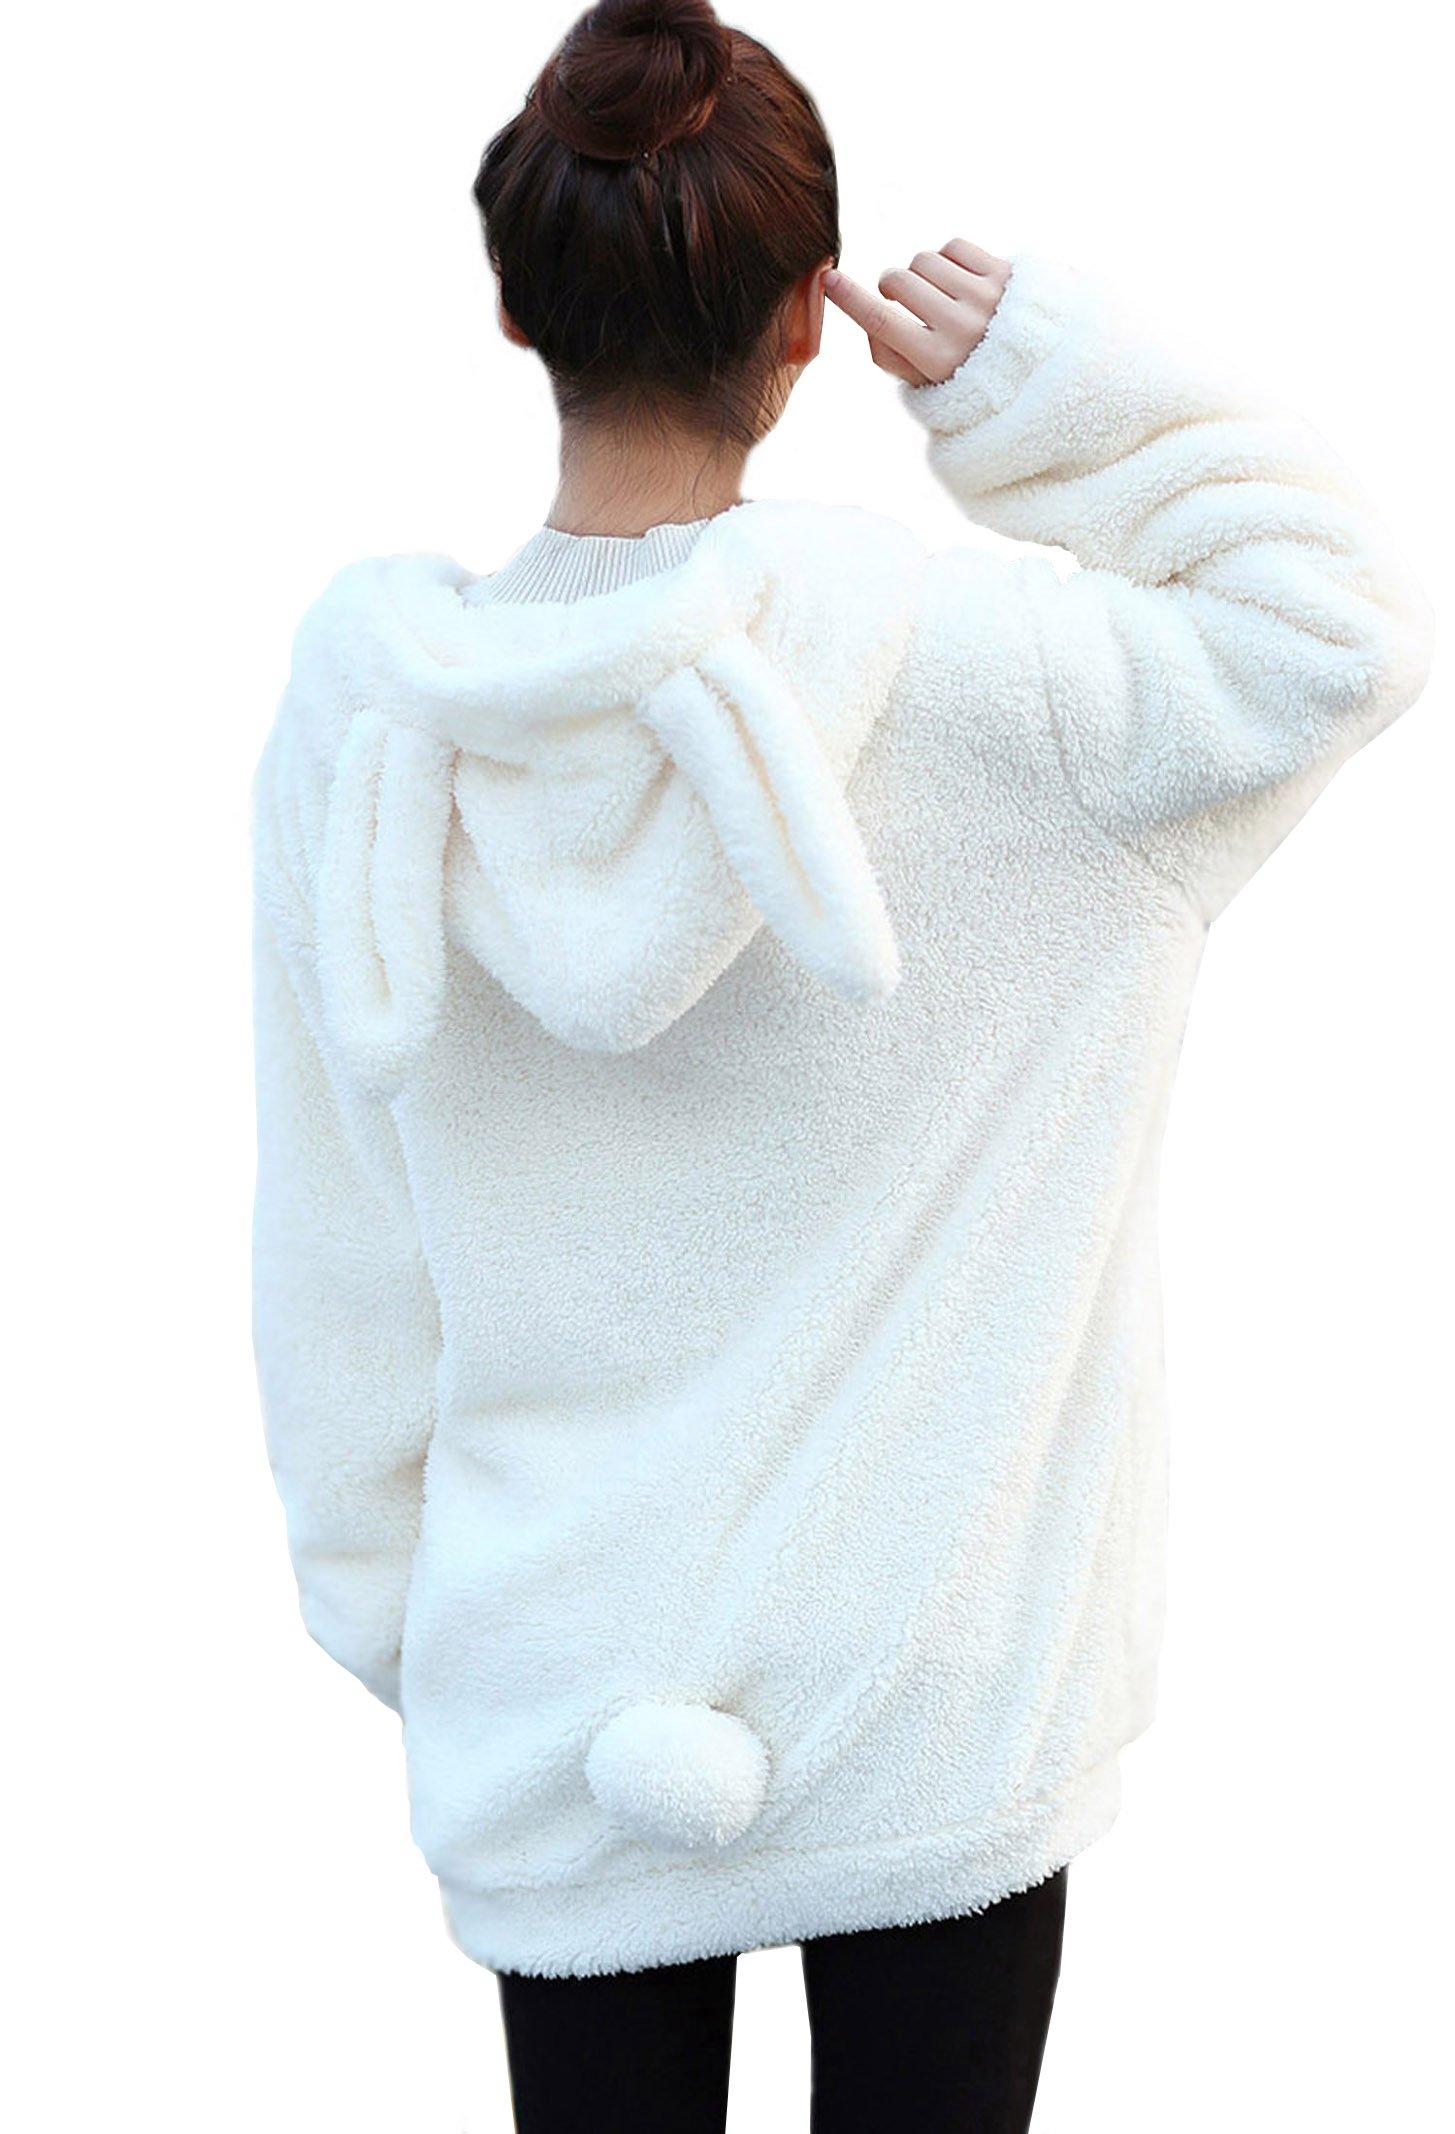 seemehappy Warm Soft Cute Bunny Shape Coat Bunny Hoodies with Ears and Tail (XXL)